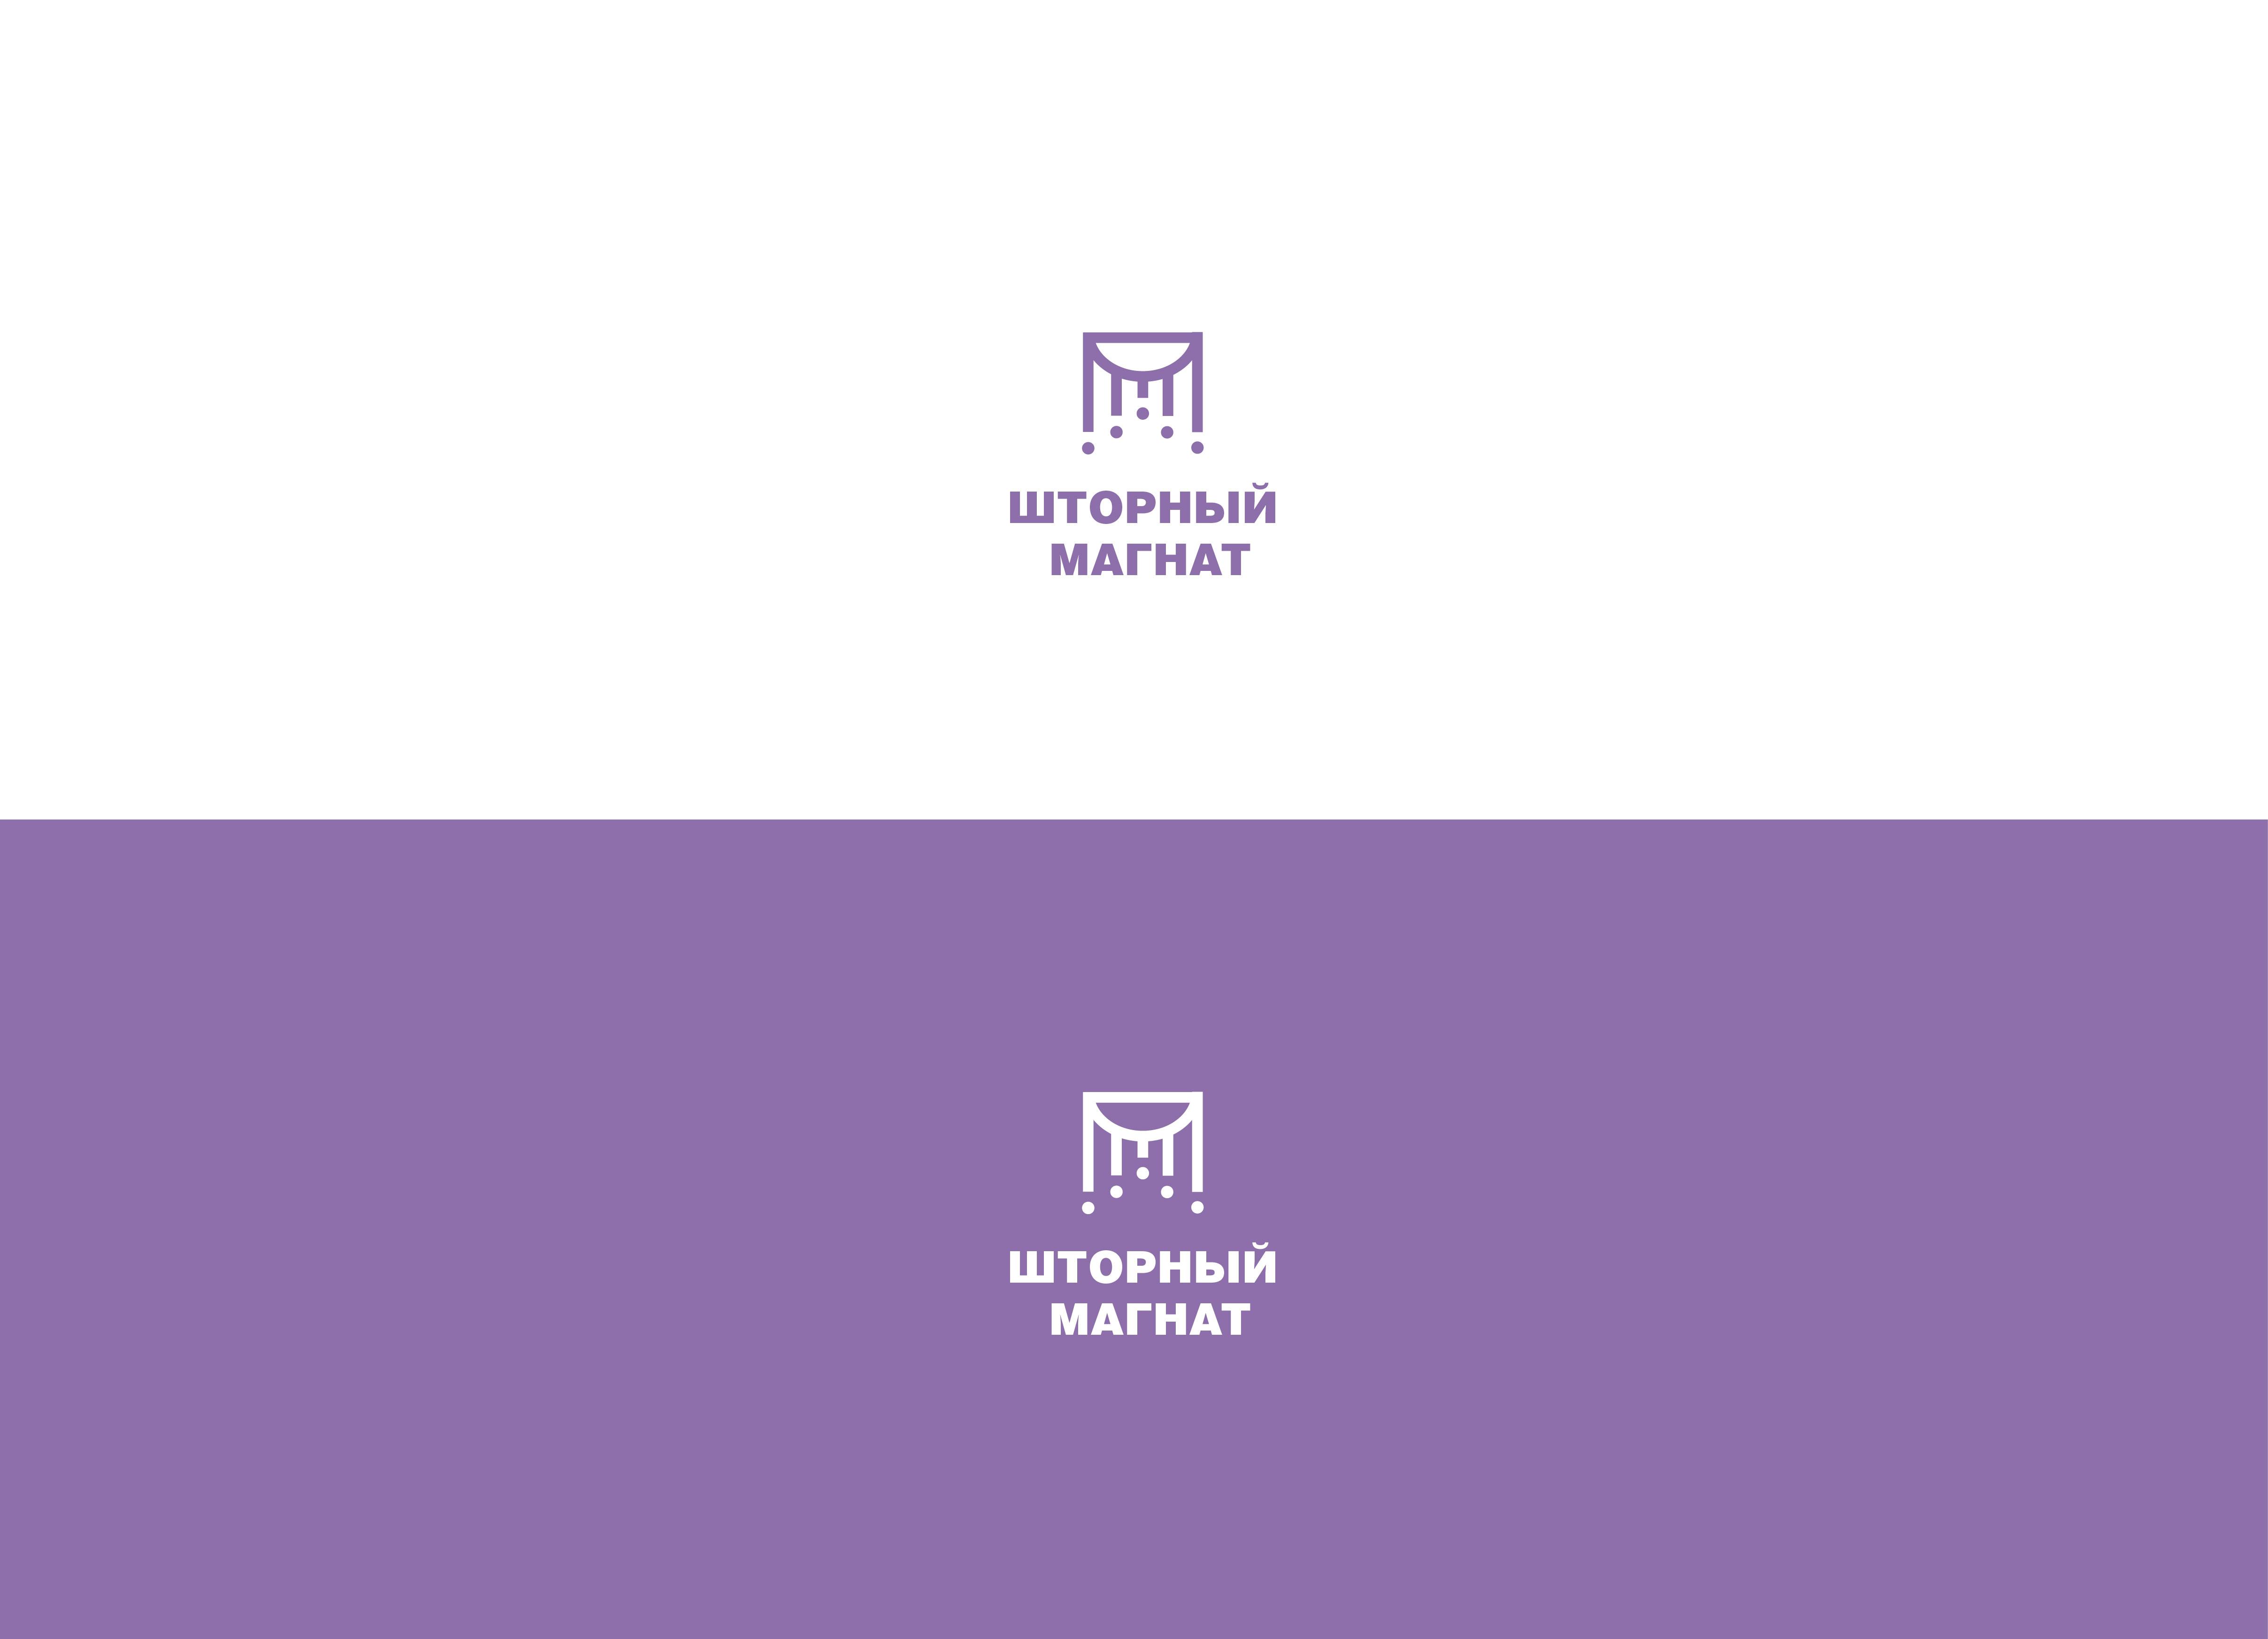 Логотип и фирменный стиль для магазина тканей. фото f_8495cd96c4e2b00e.jpg